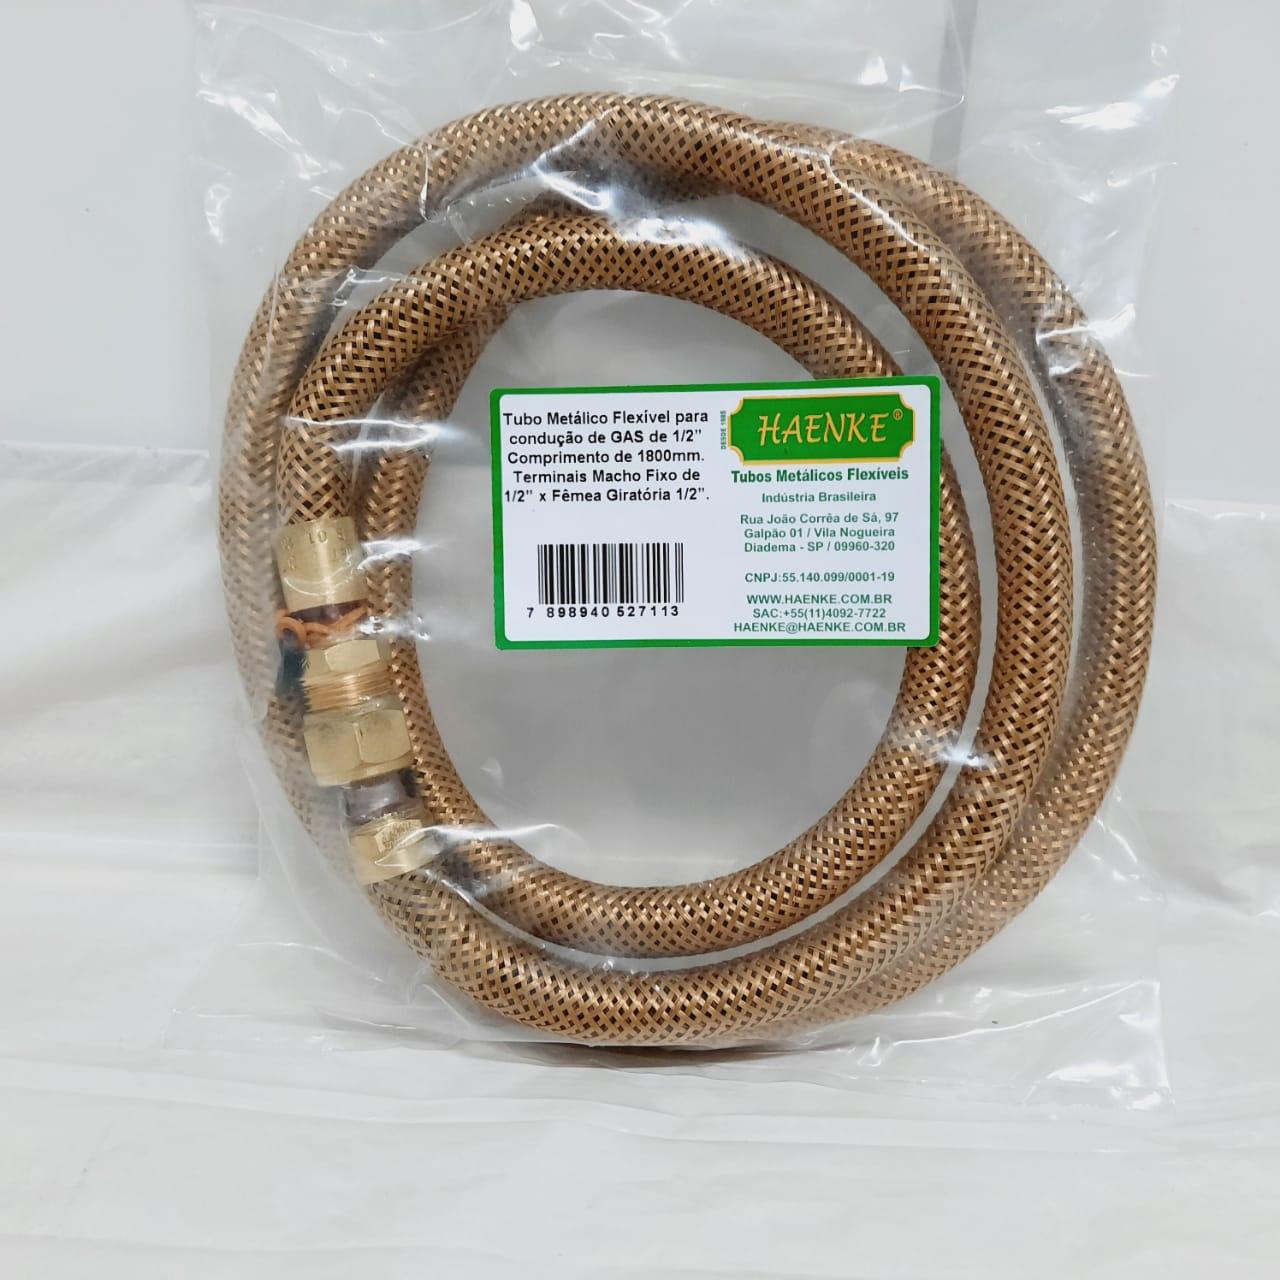 Flexível Tipo COMGÁS 1/2 1800mm Haenke